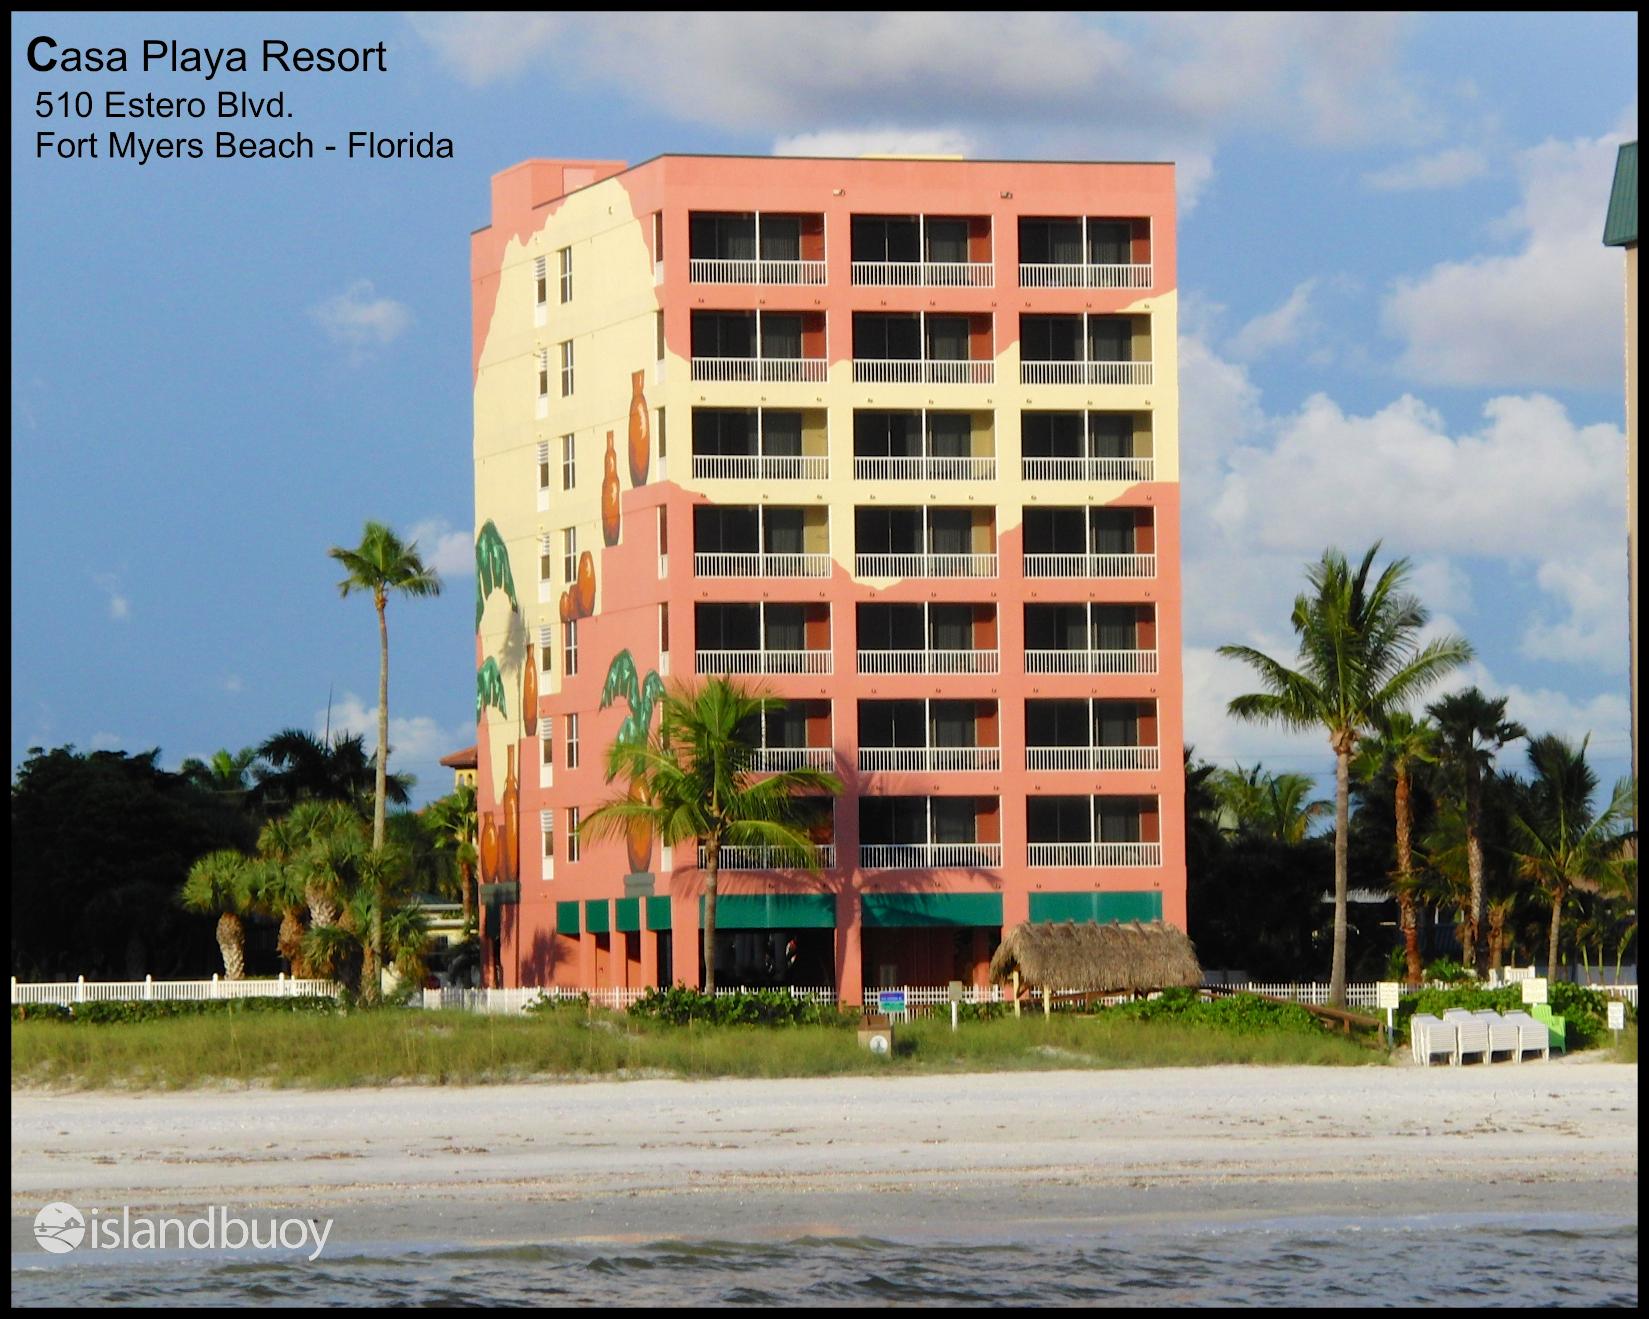 Casa Playa Resort Fort Myers Beach Florida A Condo Here At Casaplayaresort Ask For 702 And